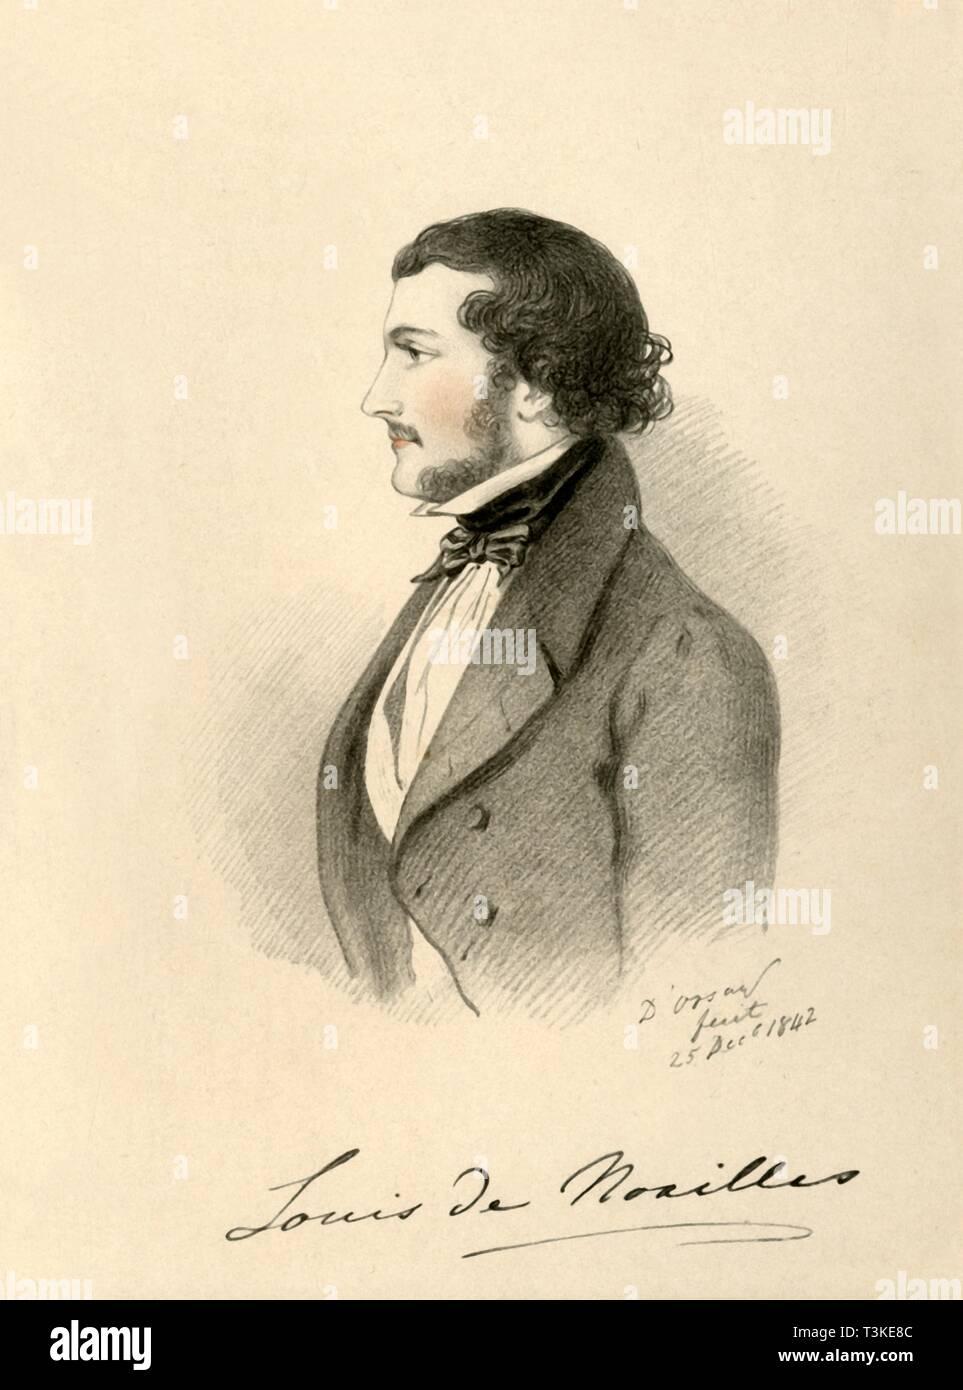 'Louis de Noailles', 1842. ???? Creator: Alfred d'Orsay. - Stock Image